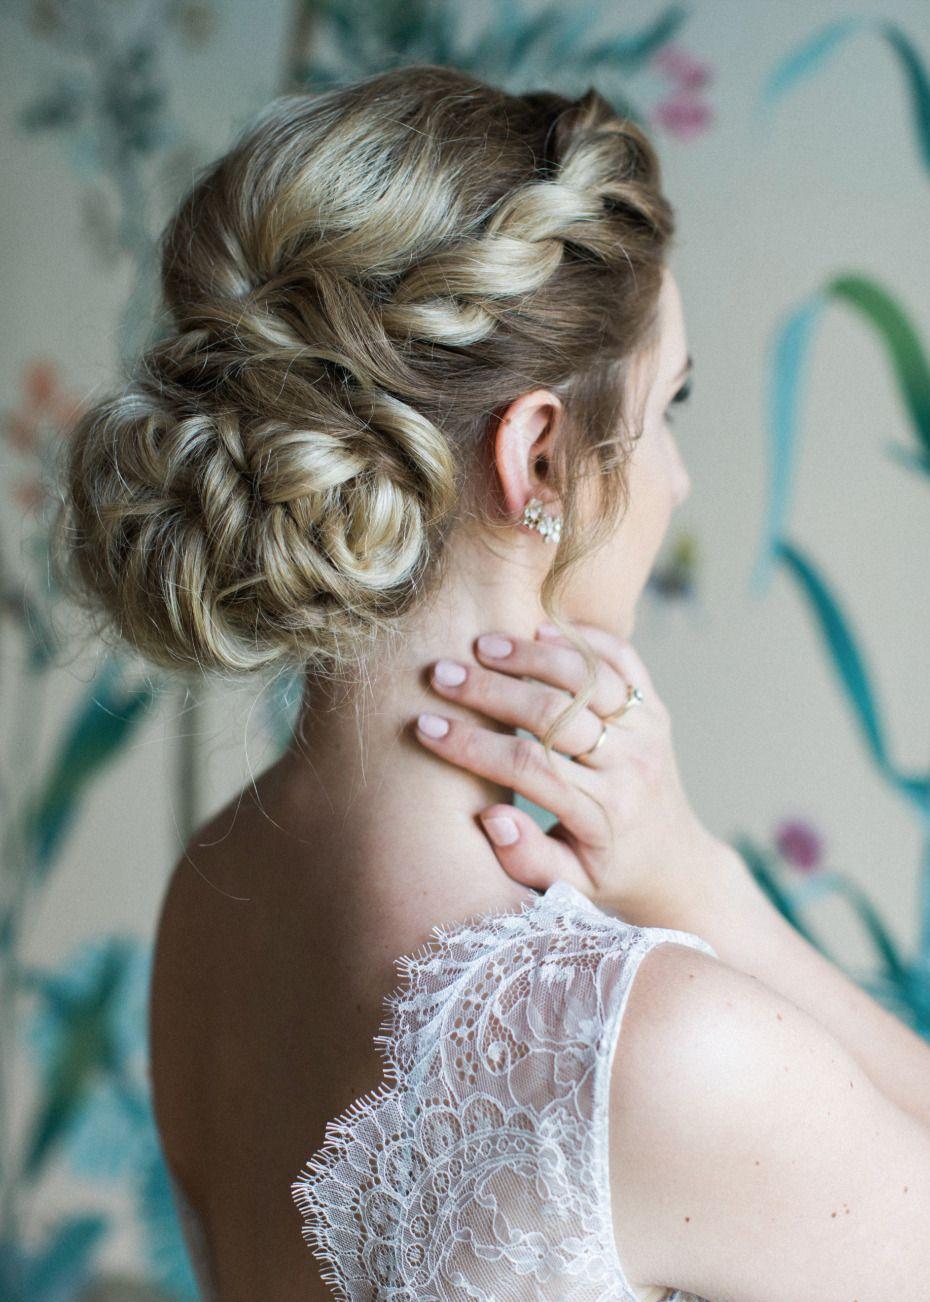 villa terrace is an italian wedding venue in the us | hair